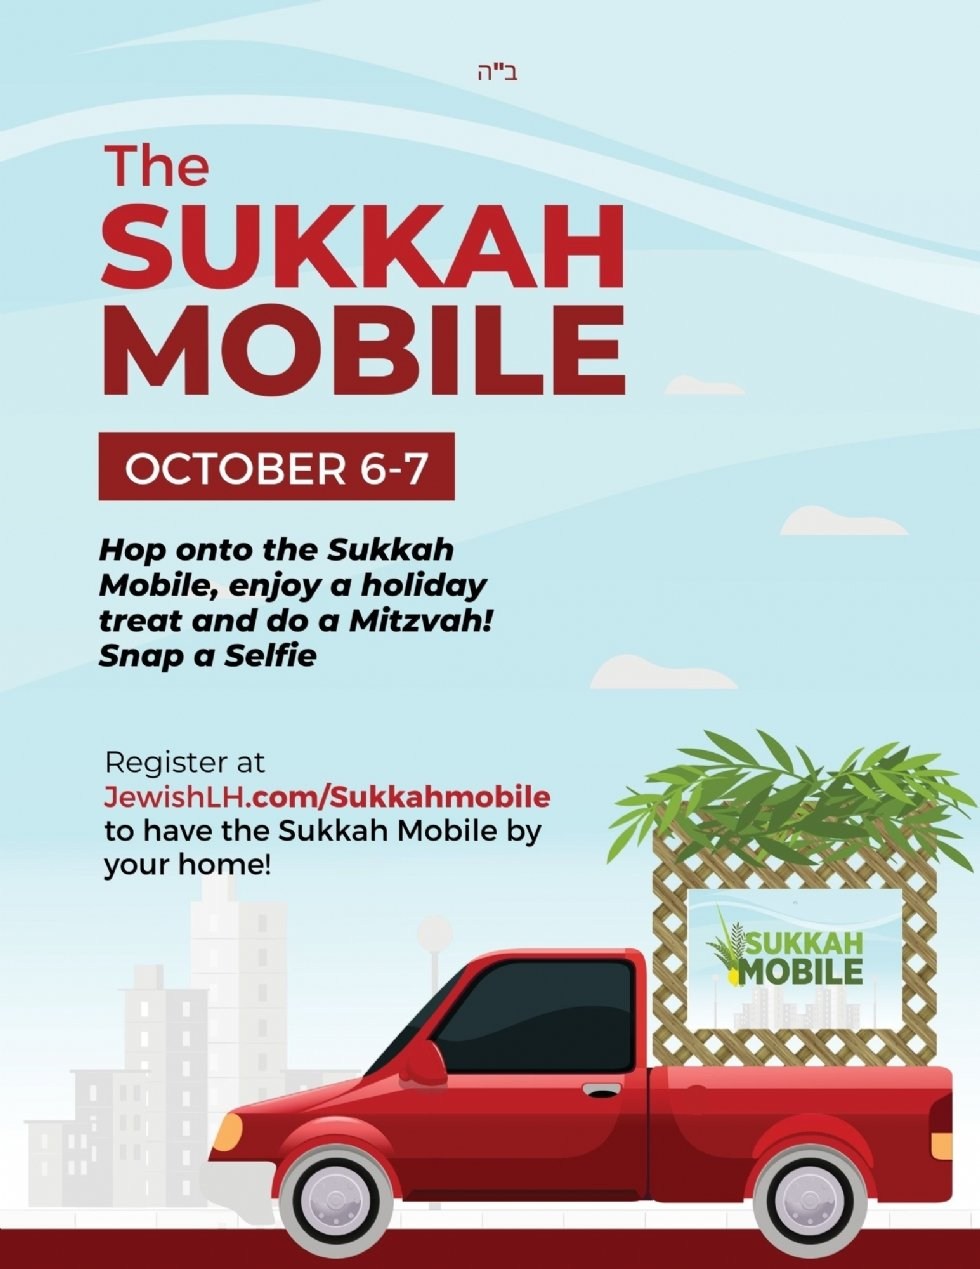 Copy of Sukkah Mobile Flyer.jpg